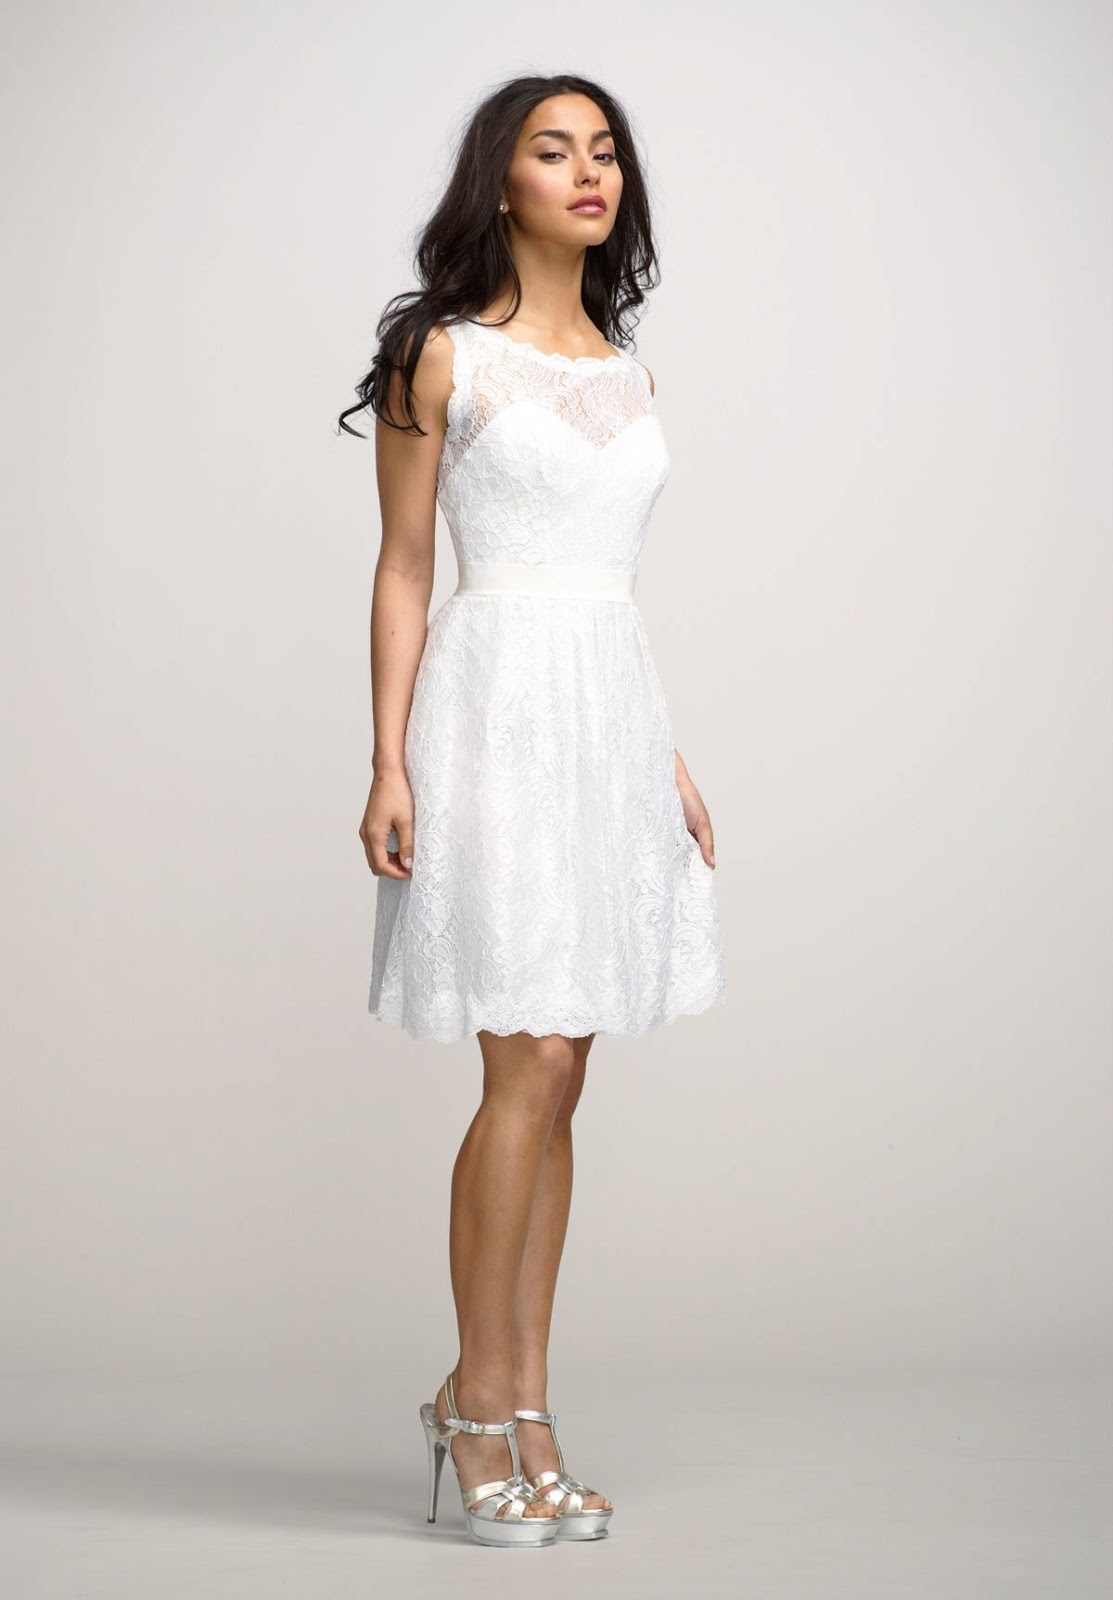 Bride Dresses For Reception